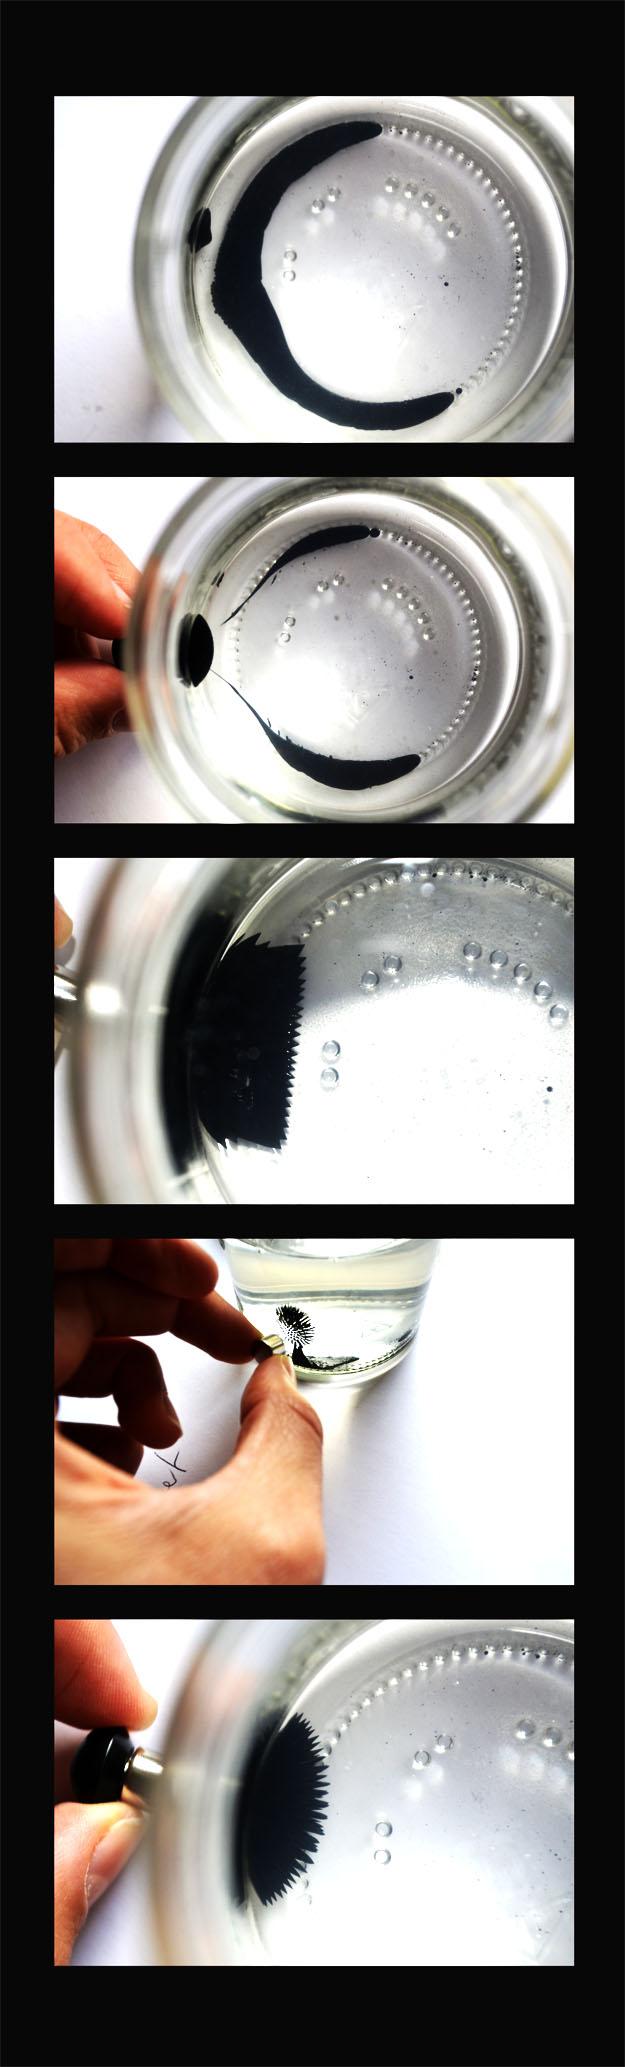 FerroFluid- various faces - Magnetism of liquid nano-particles